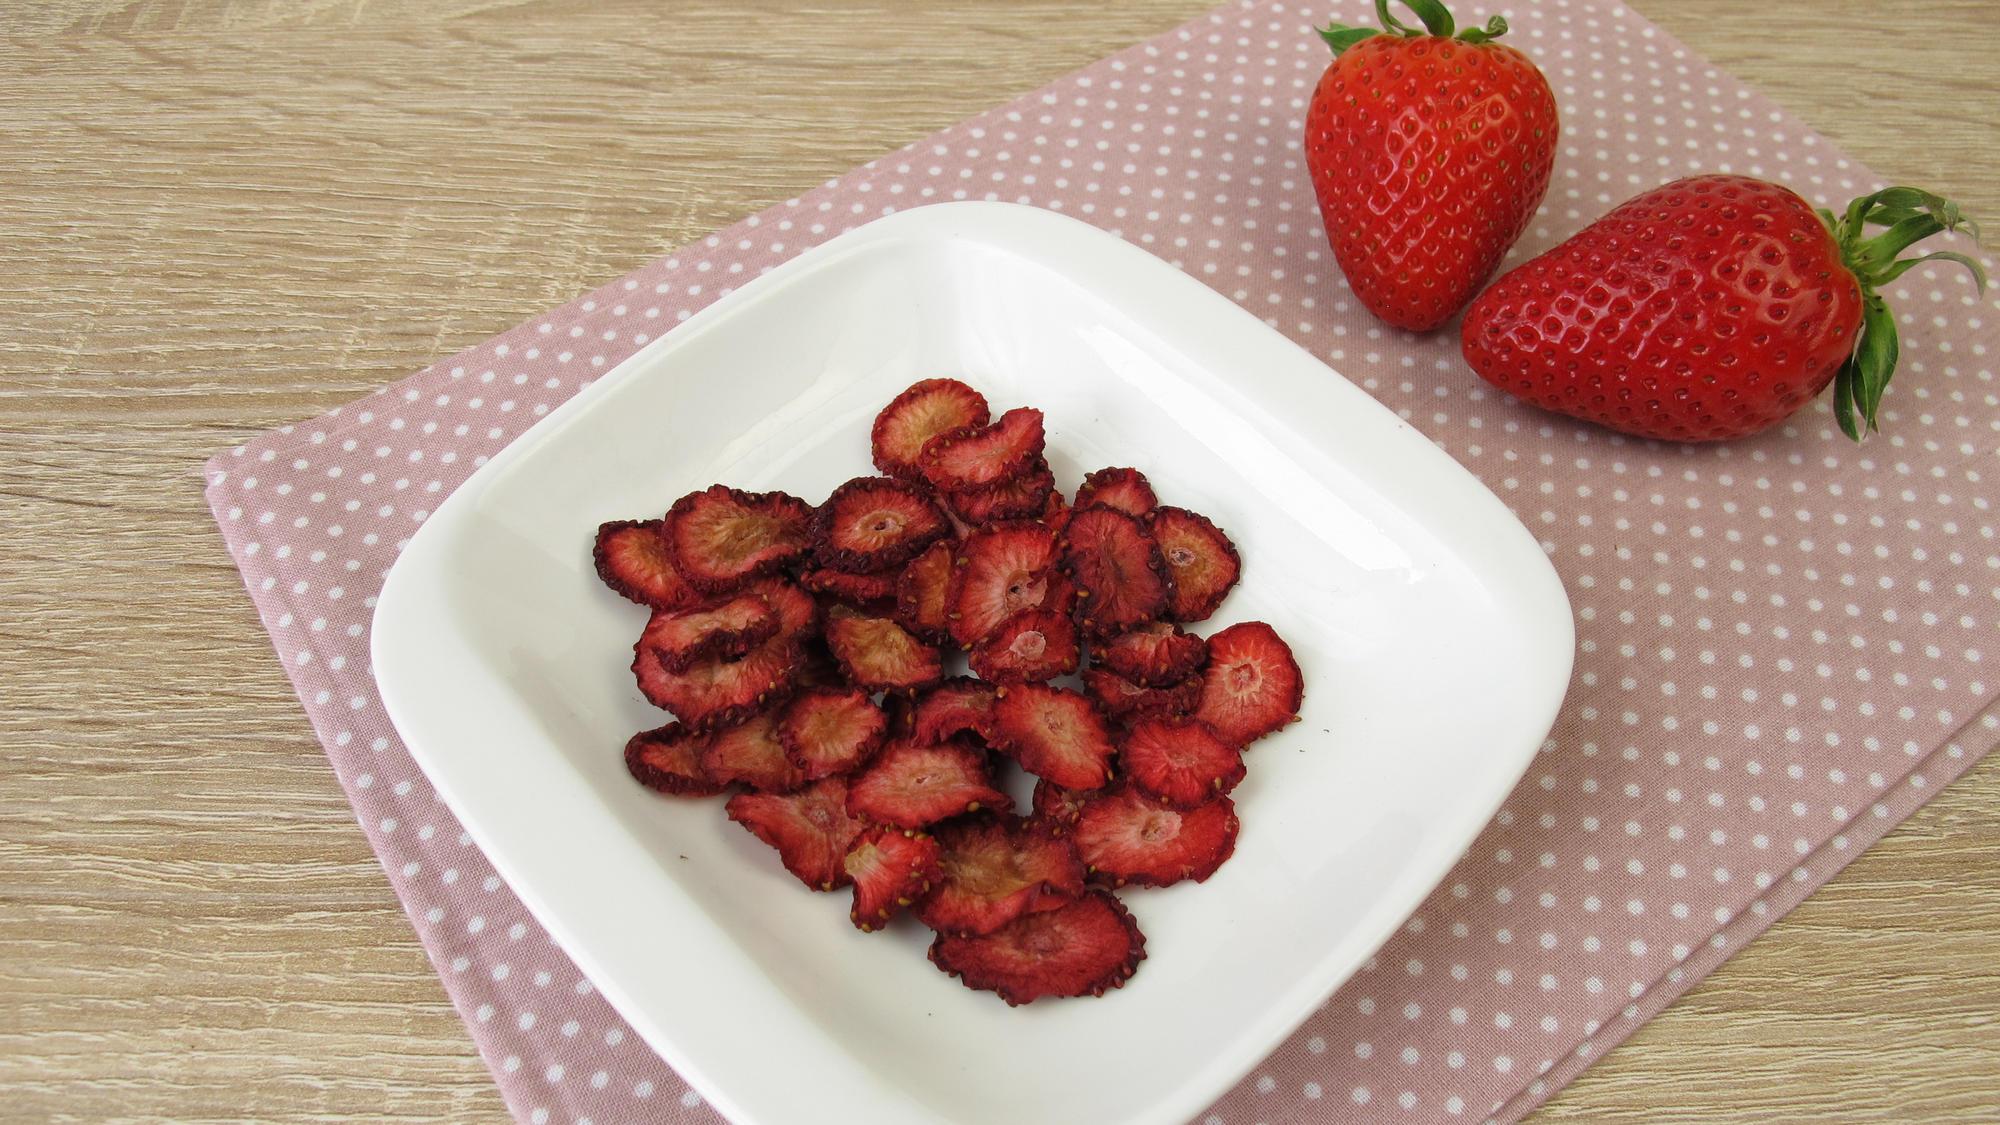 selbstgemachte Erdbeerchips